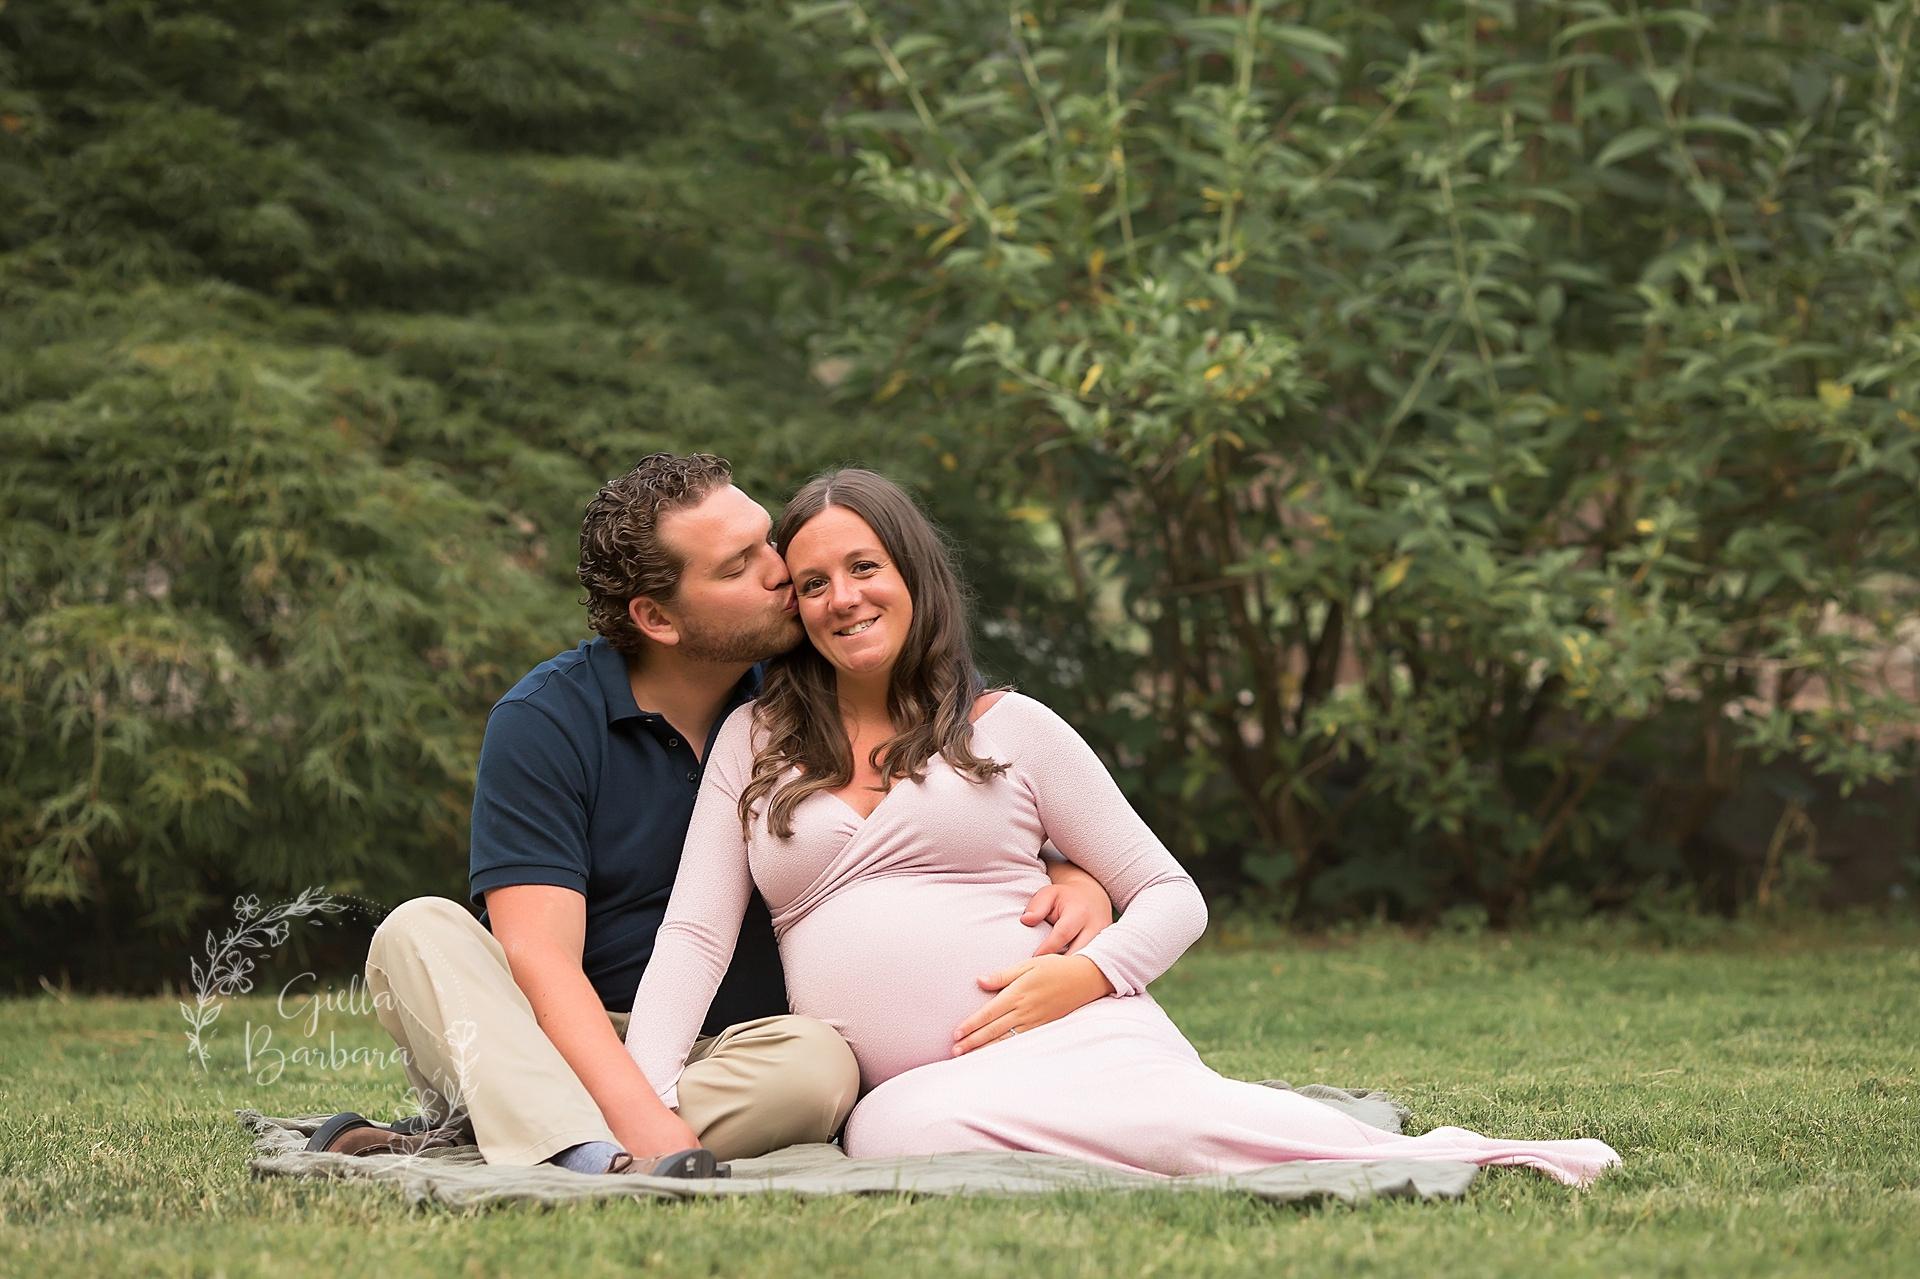 Sunset Garden Maternity Photography